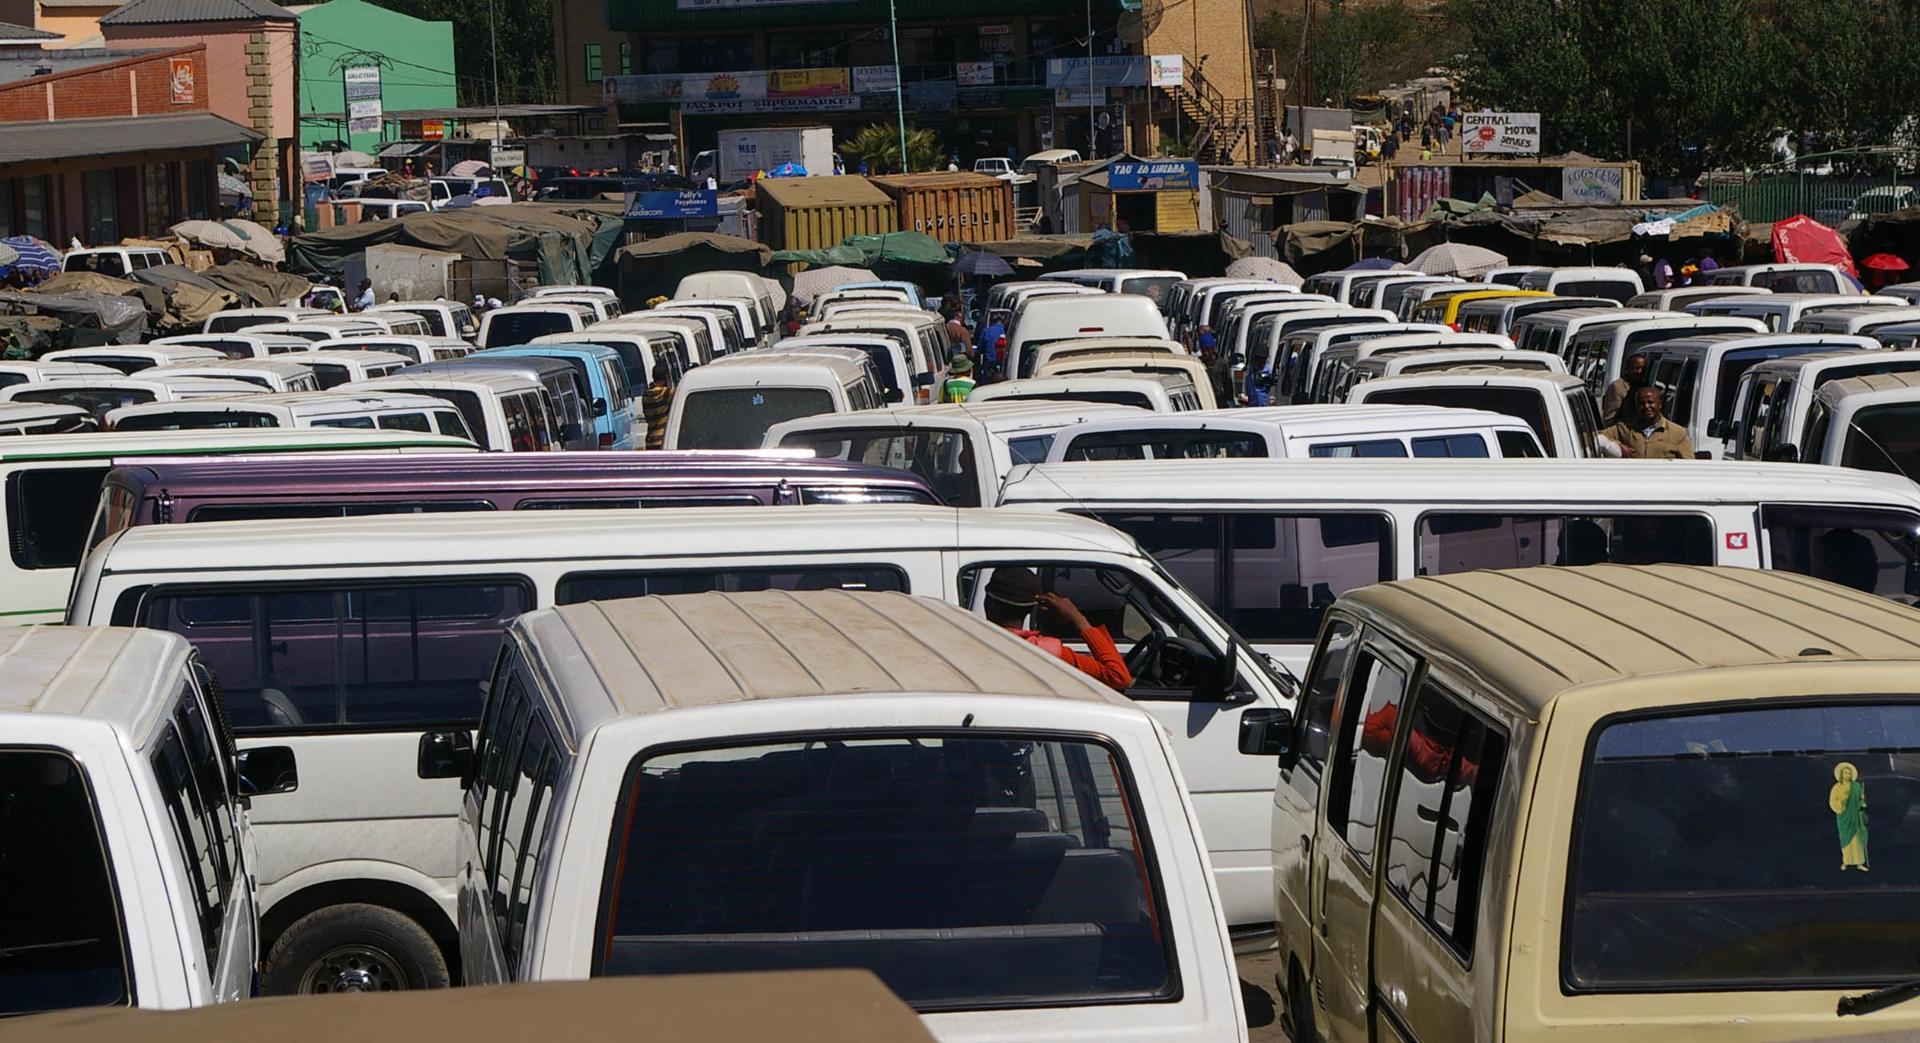 Operators unhappy with taxi fare increase